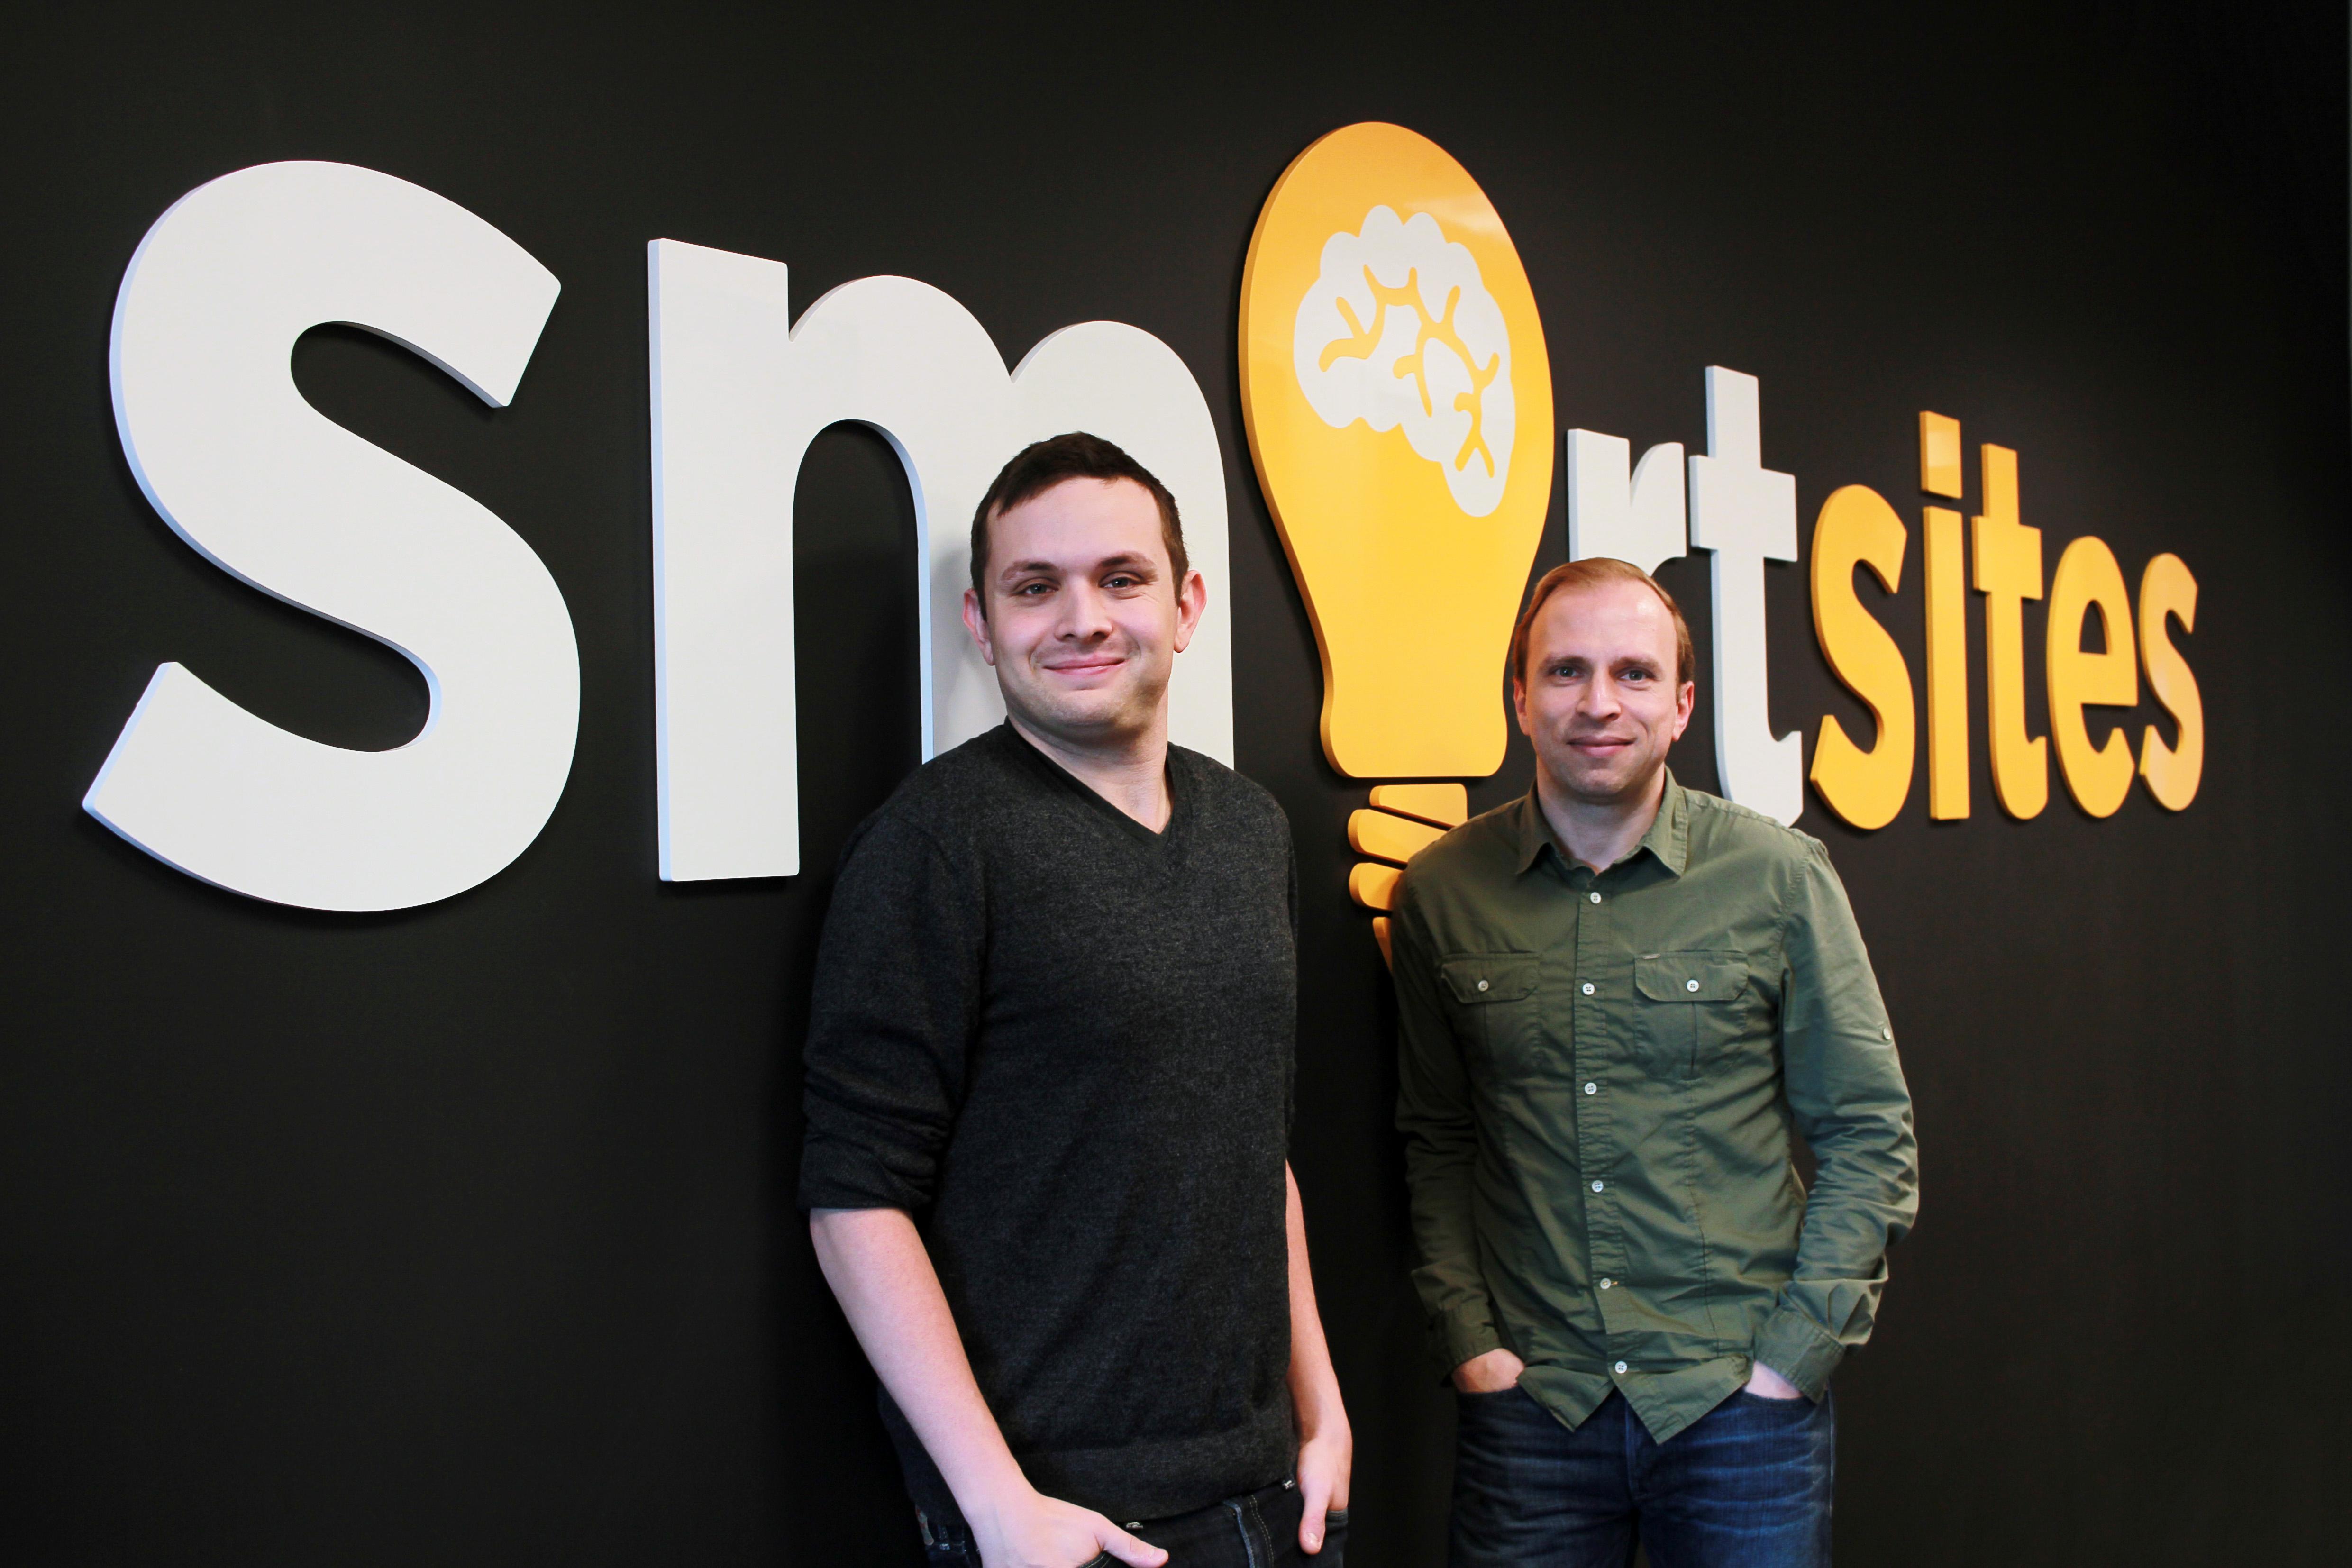 SmartSites image